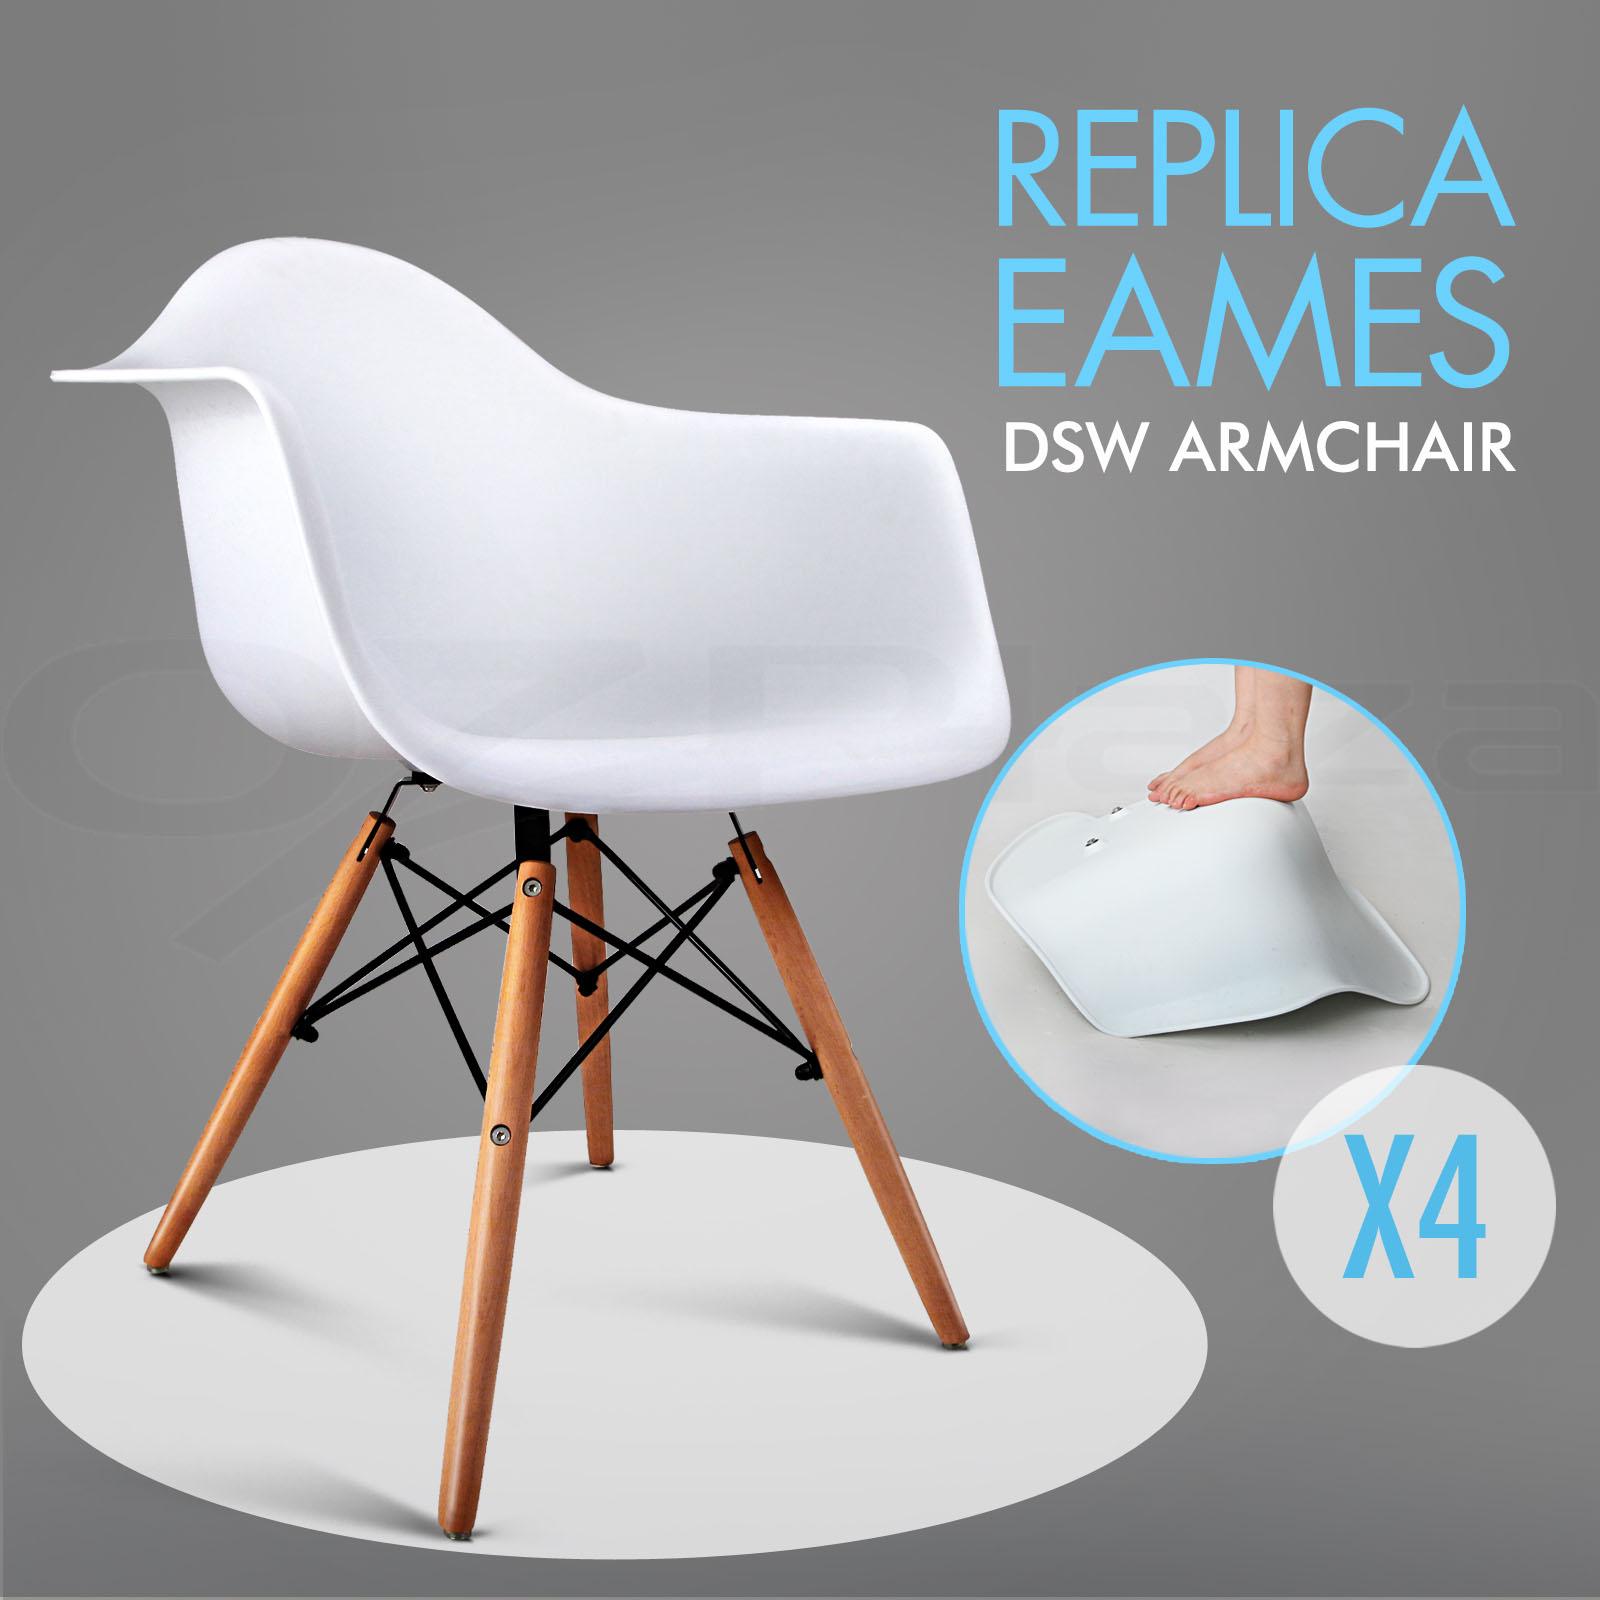 4 X Retro Replica Eames Dsw Dining Chair Daw Armchair Foam